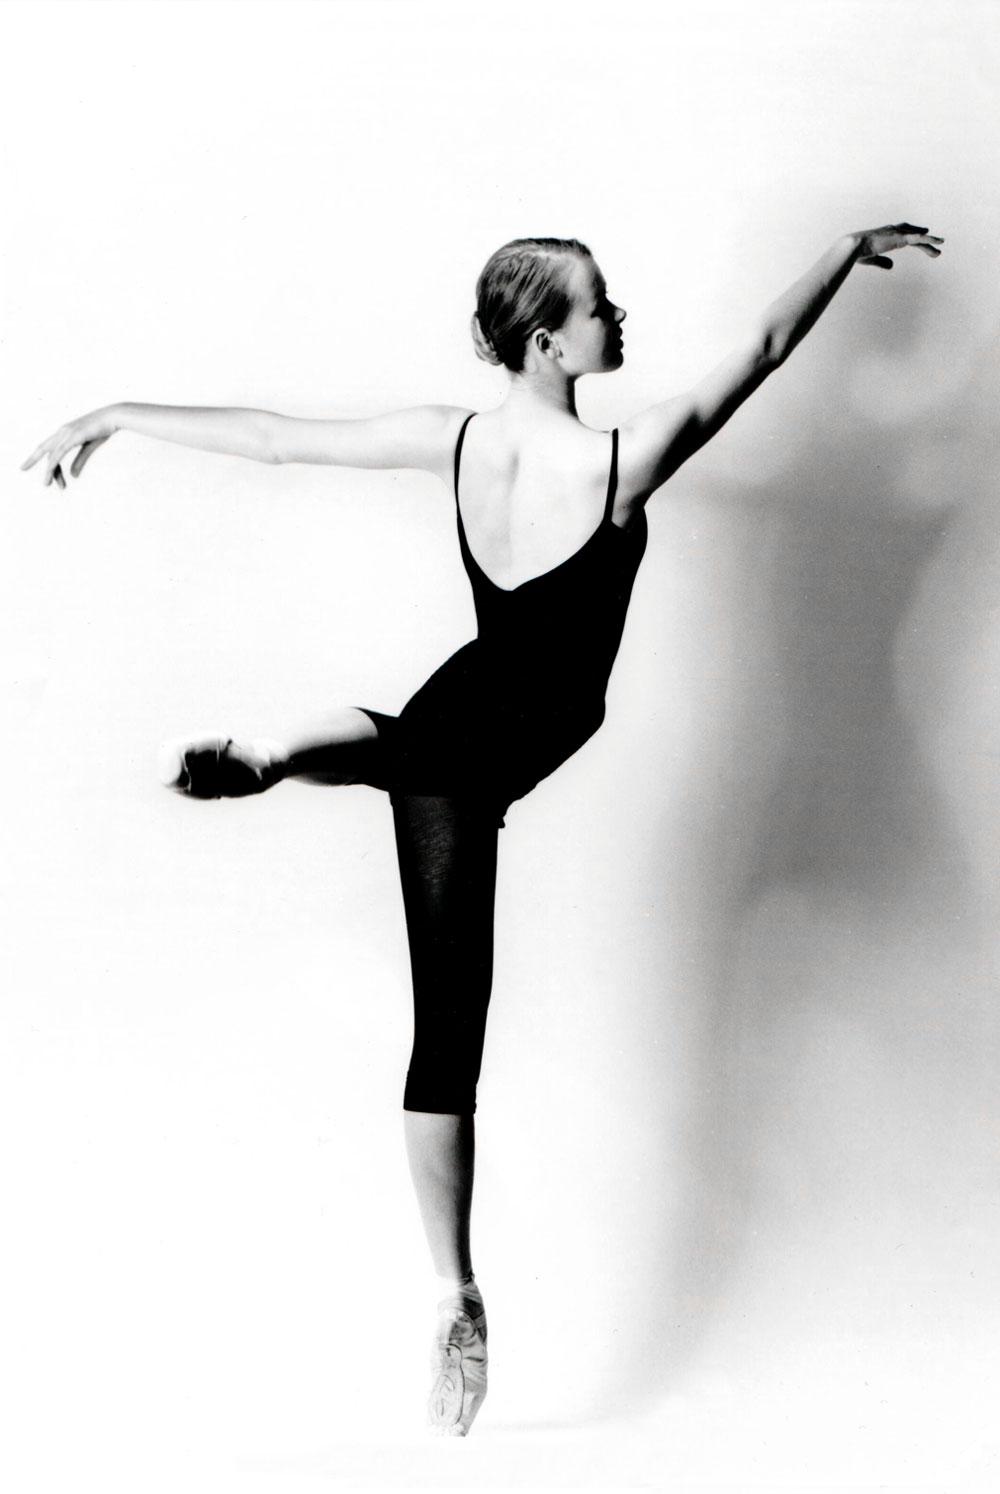 Prima Ballerina | Lindsay Nathanson Photography